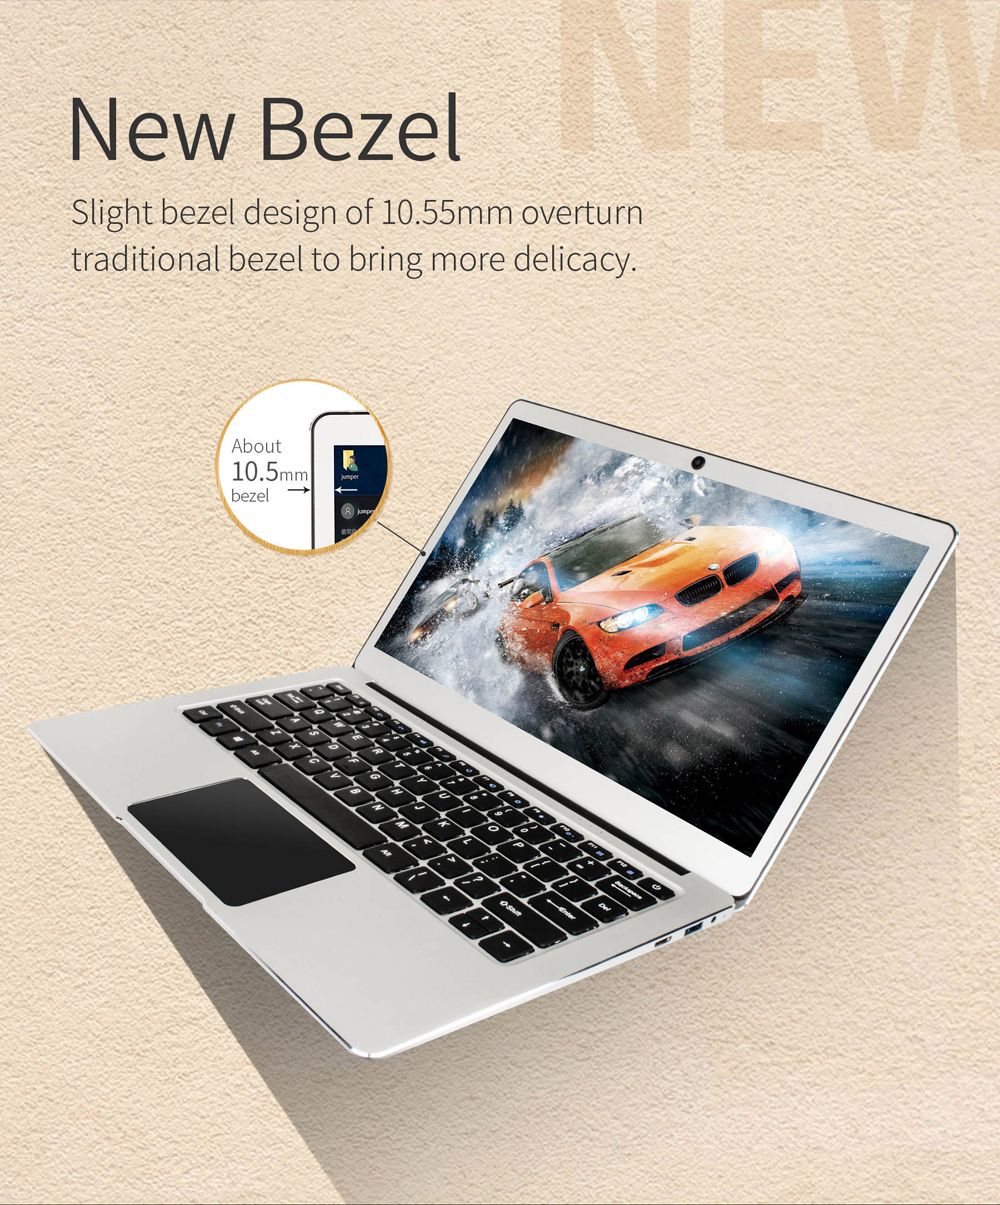 Jersey EZbook 3 Pro portátil pantalla IPS de 13,3 pulgadas Intel J3455 6GB + 64GB Notebook 2,4G/5G WiFi con M.2 SATA SSD ranura Golooloo 6600mAH batería del ordenador portátil para Acer Aspire AS10D31 AS10D41 AS10D51 AS10D61 AS10D71 AS10D75 AS10D75 AS10D81 AS10G31 AS10D5E